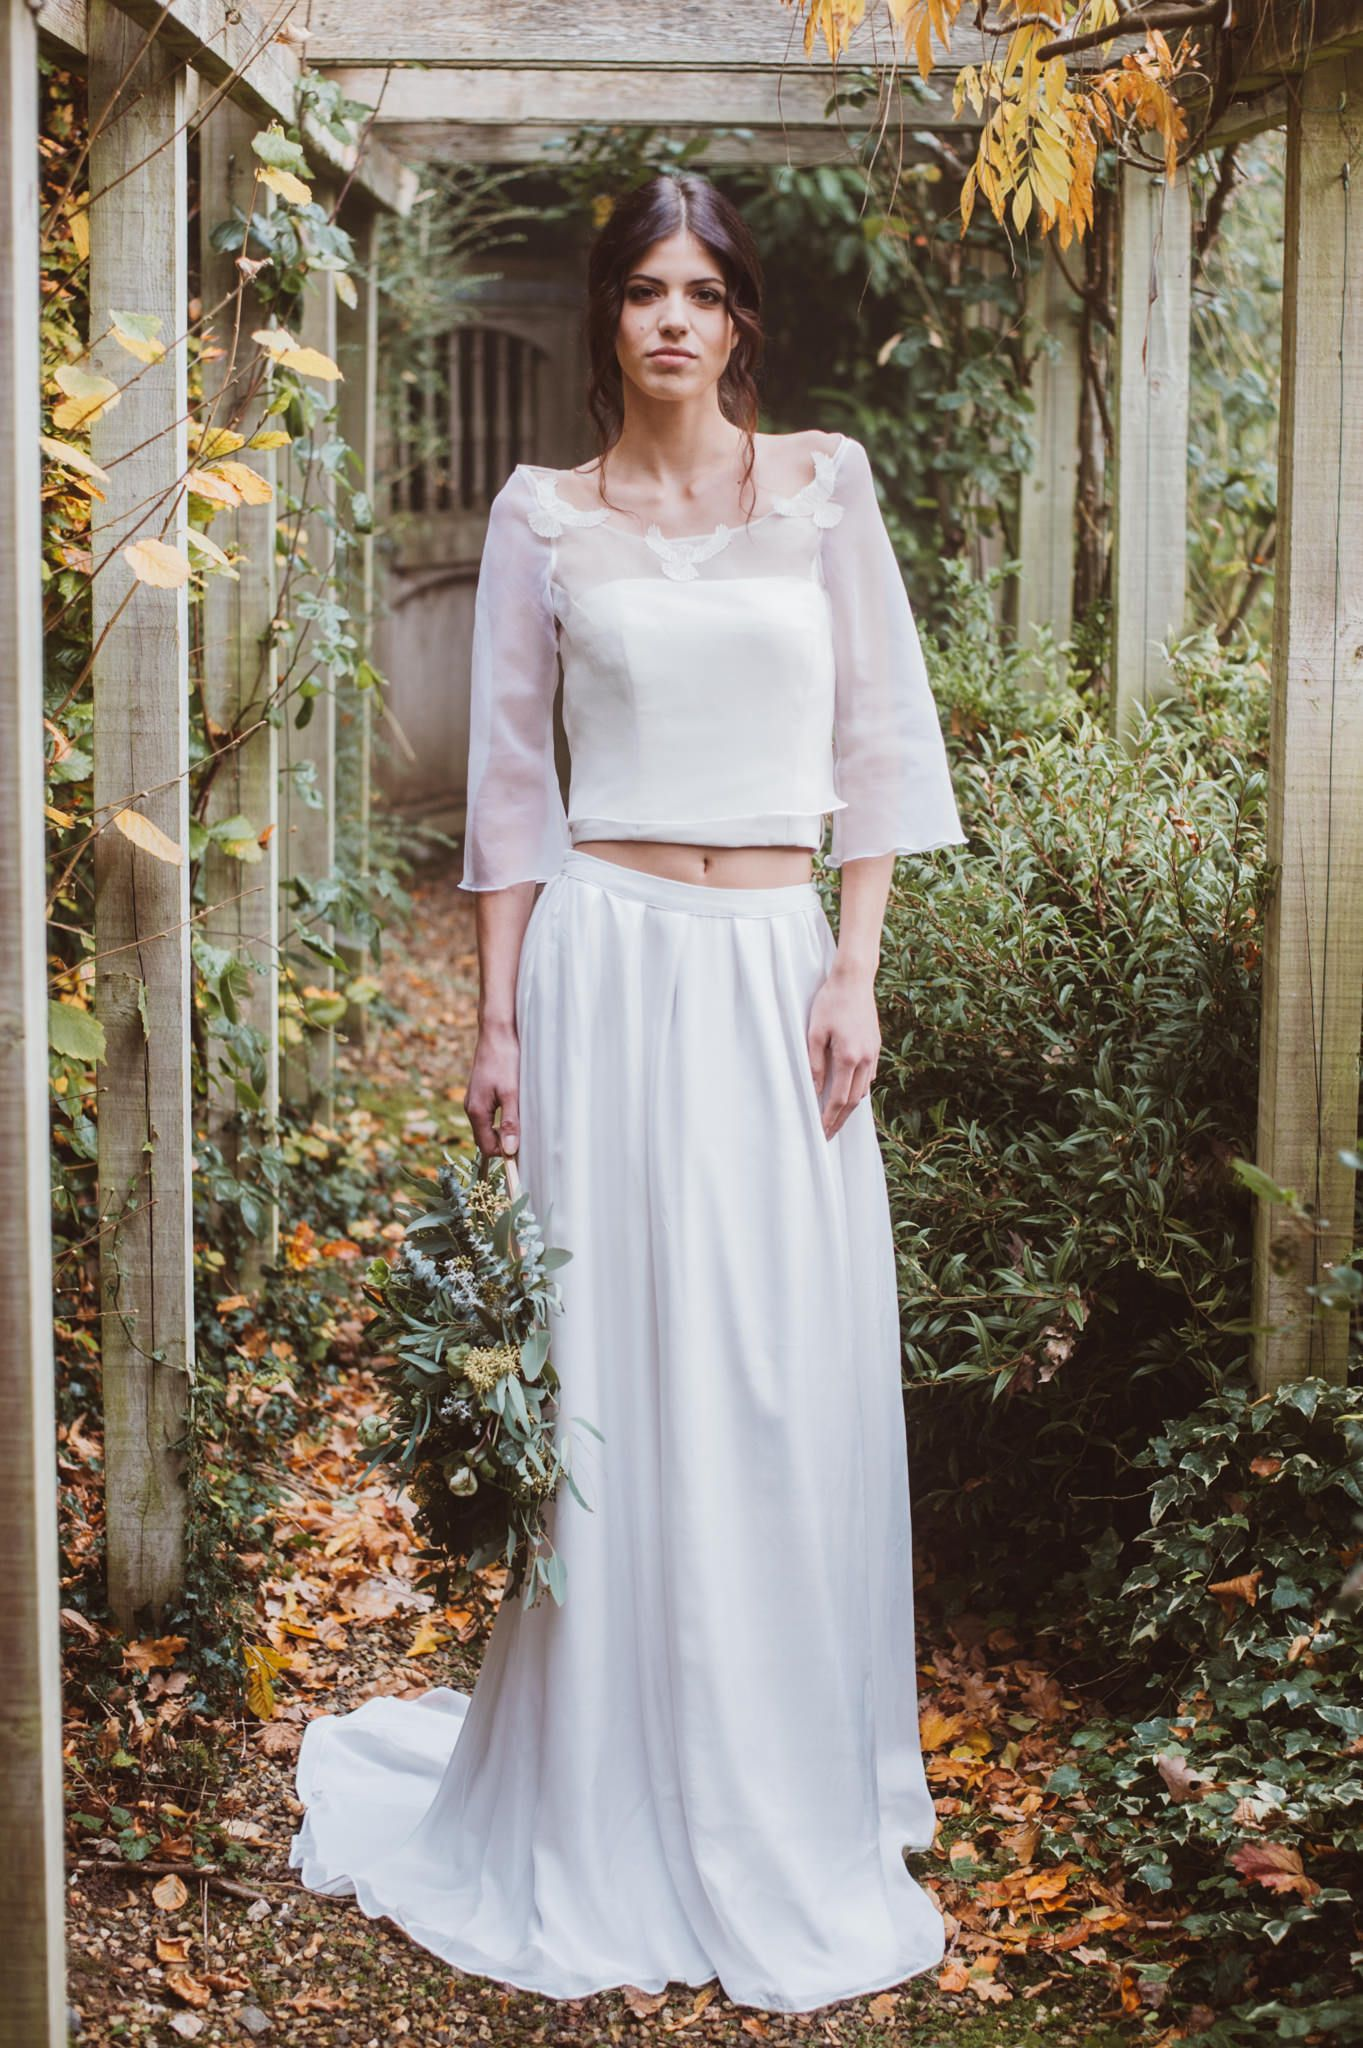 A subtle bohemian style wedding dress by jessica turner